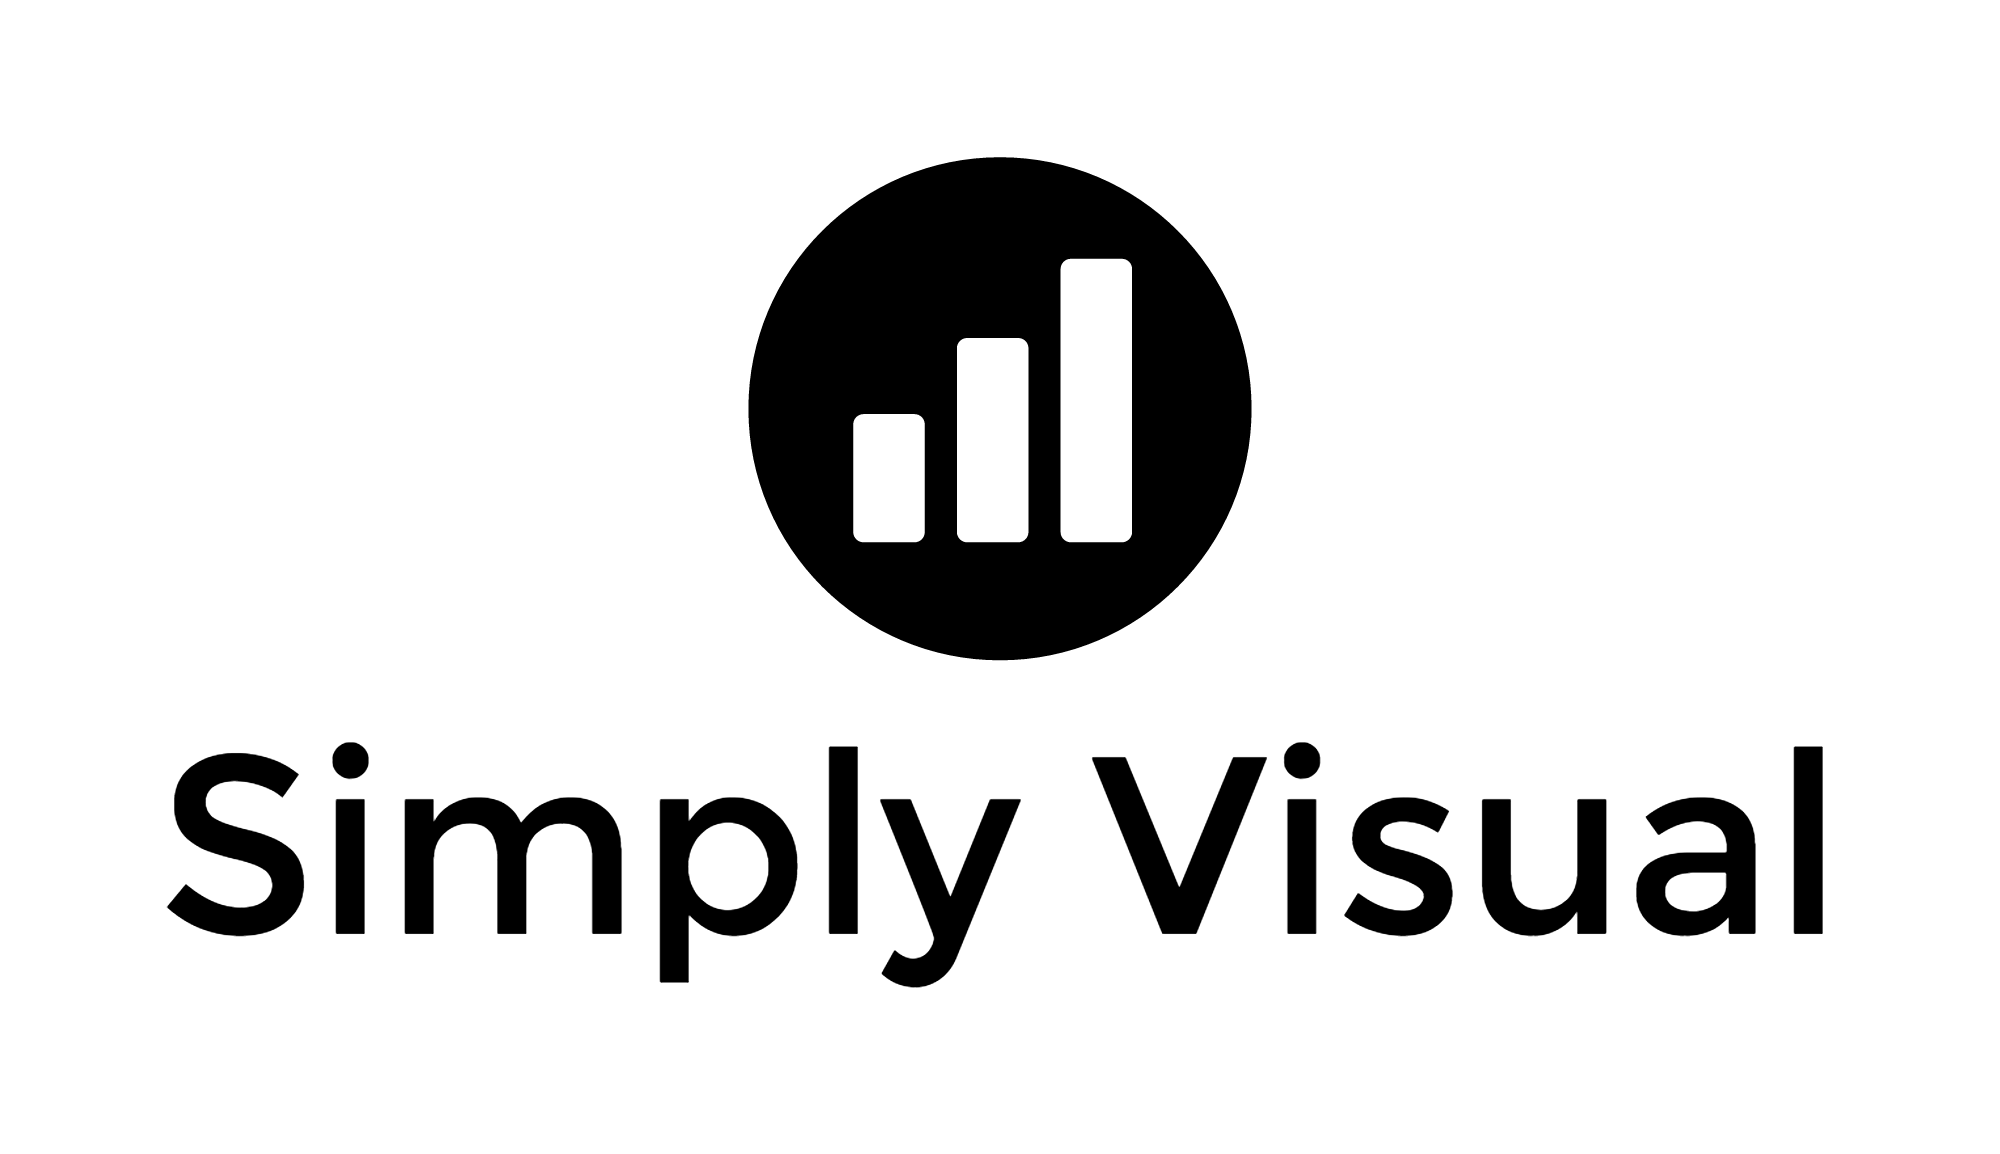 bar graph black.png